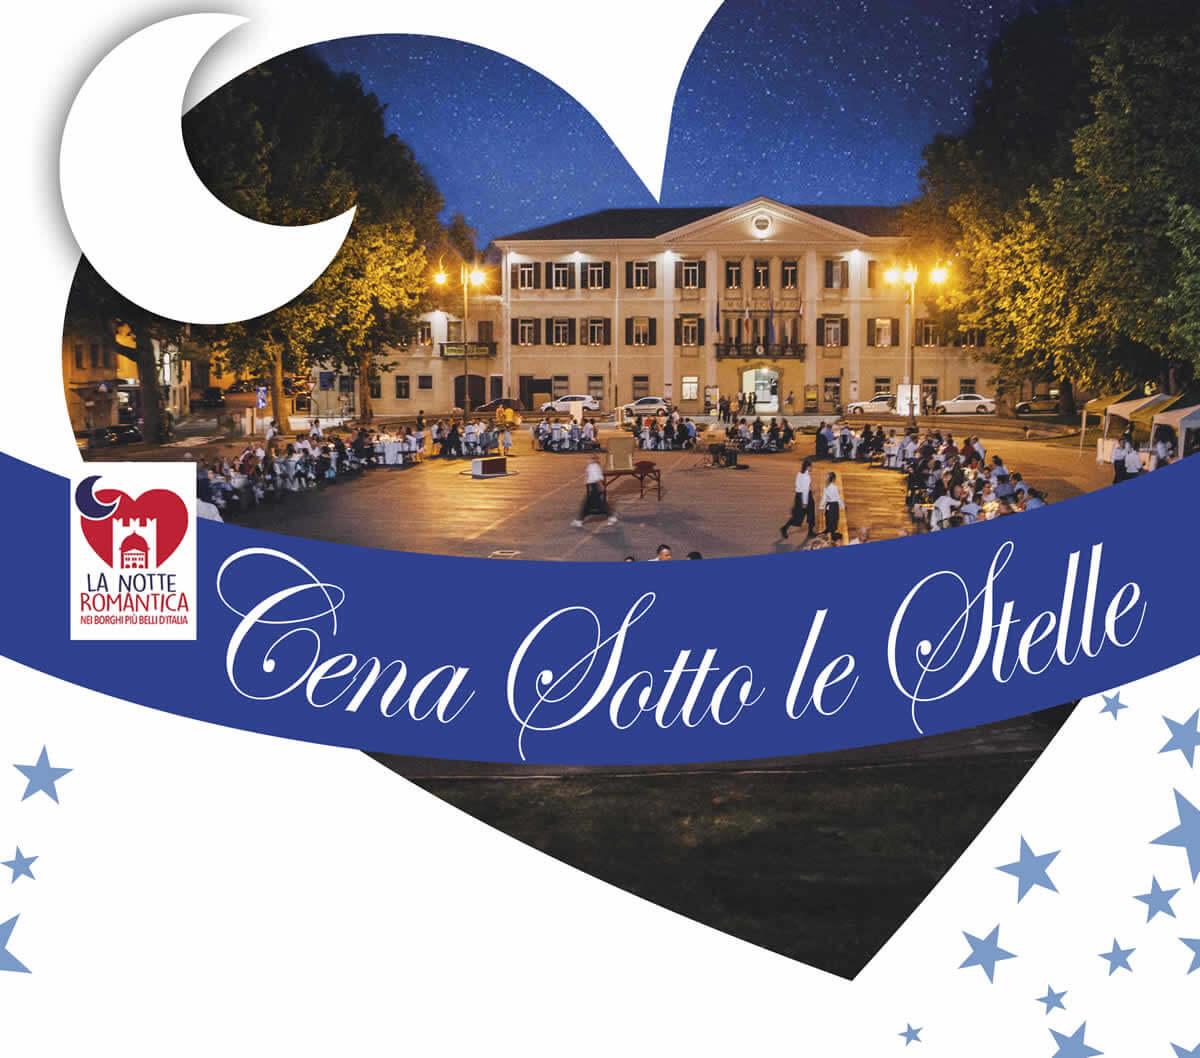 Fagnana, Cena sotto le stelle 2018